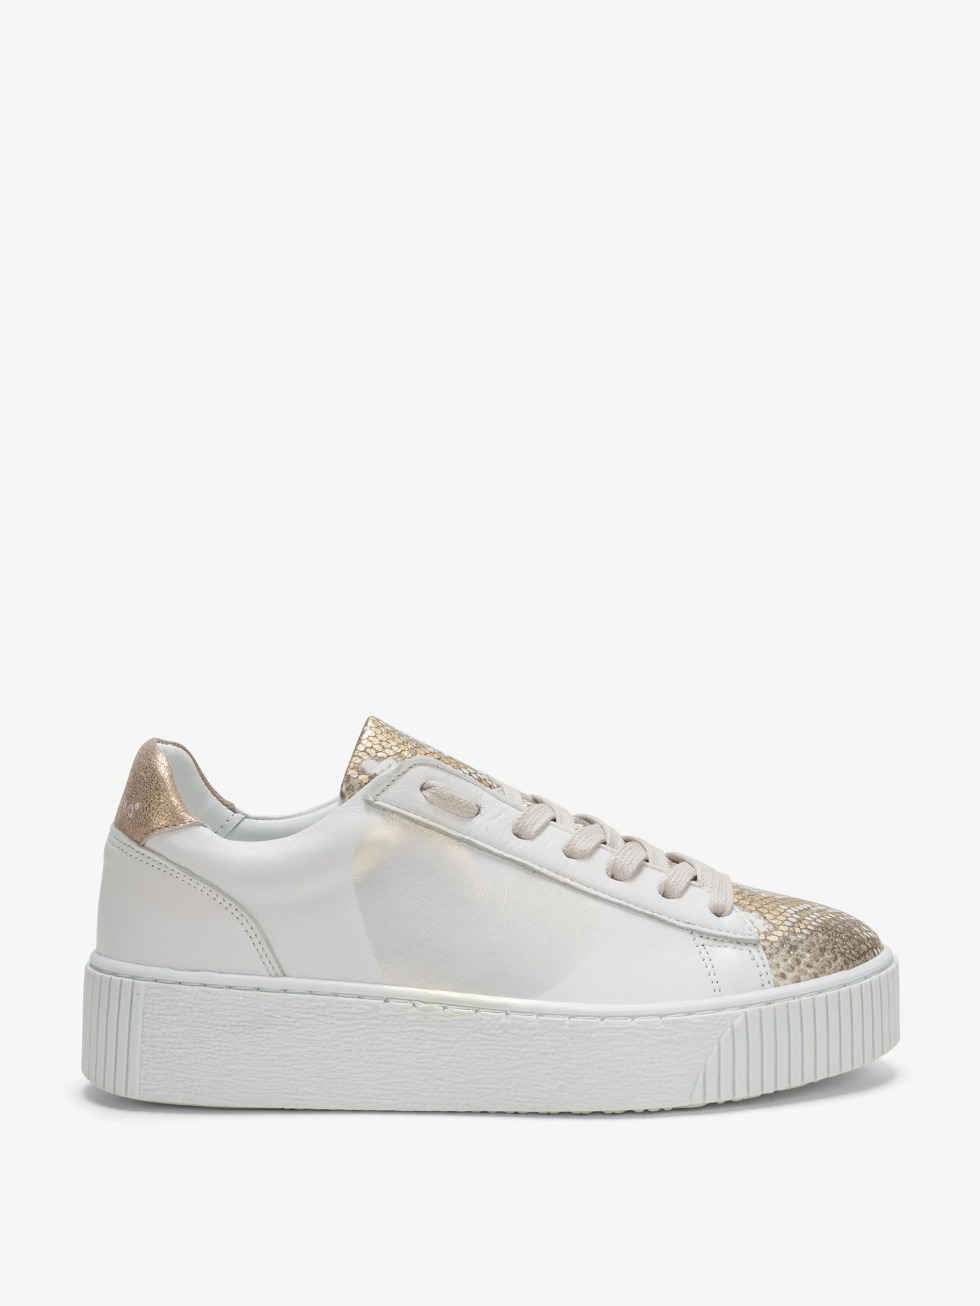 Cosmopolitan Sneakers - Phyton Gold Heart